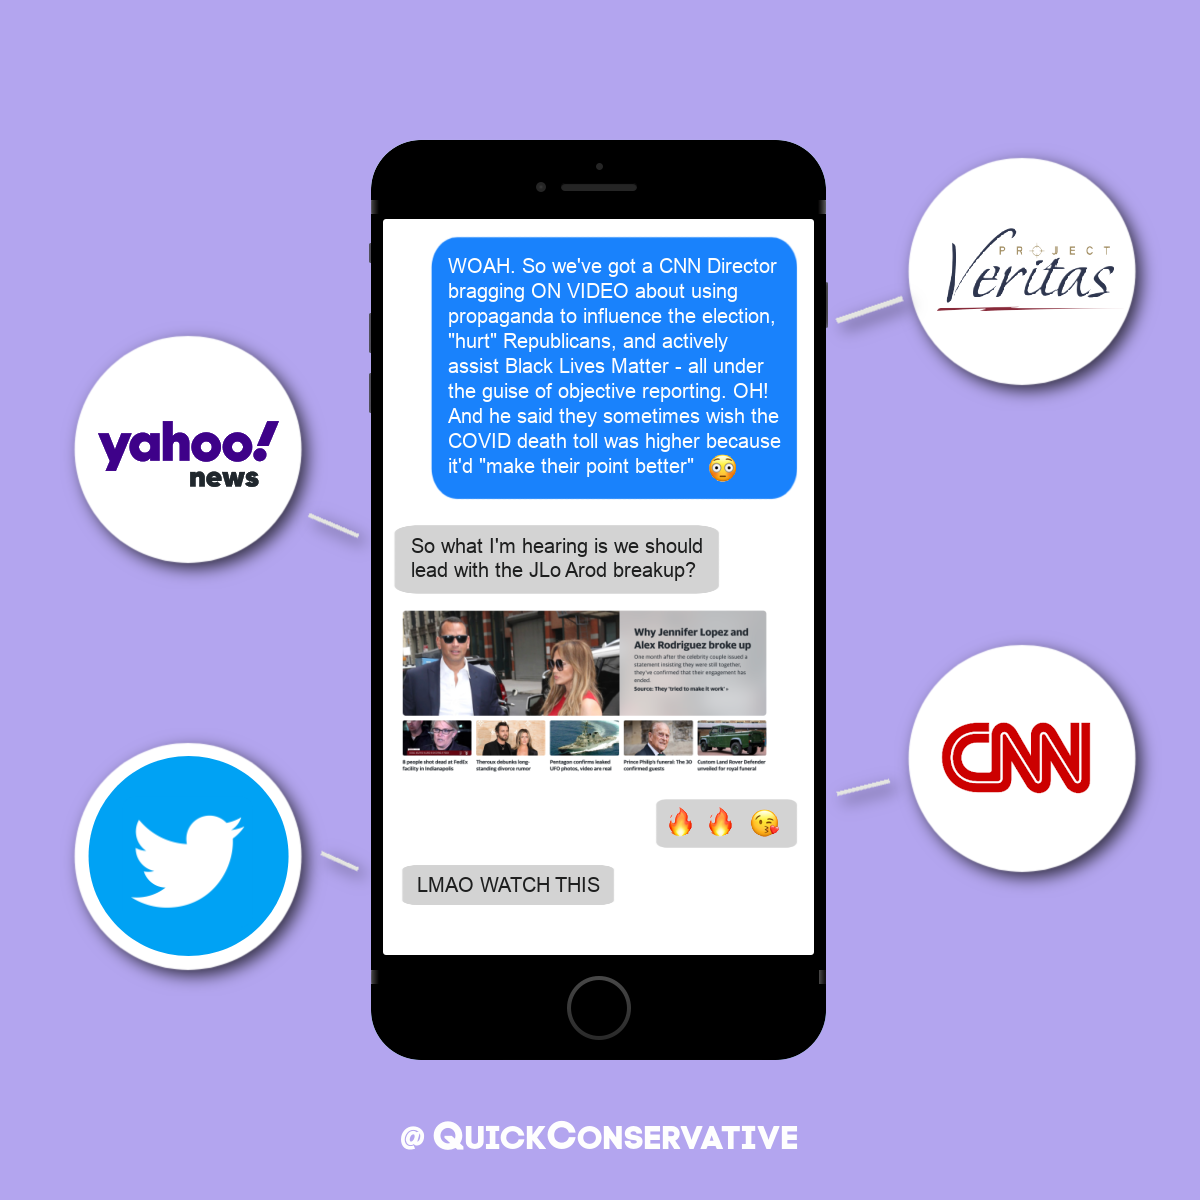 Twitter Bans James OKeefe